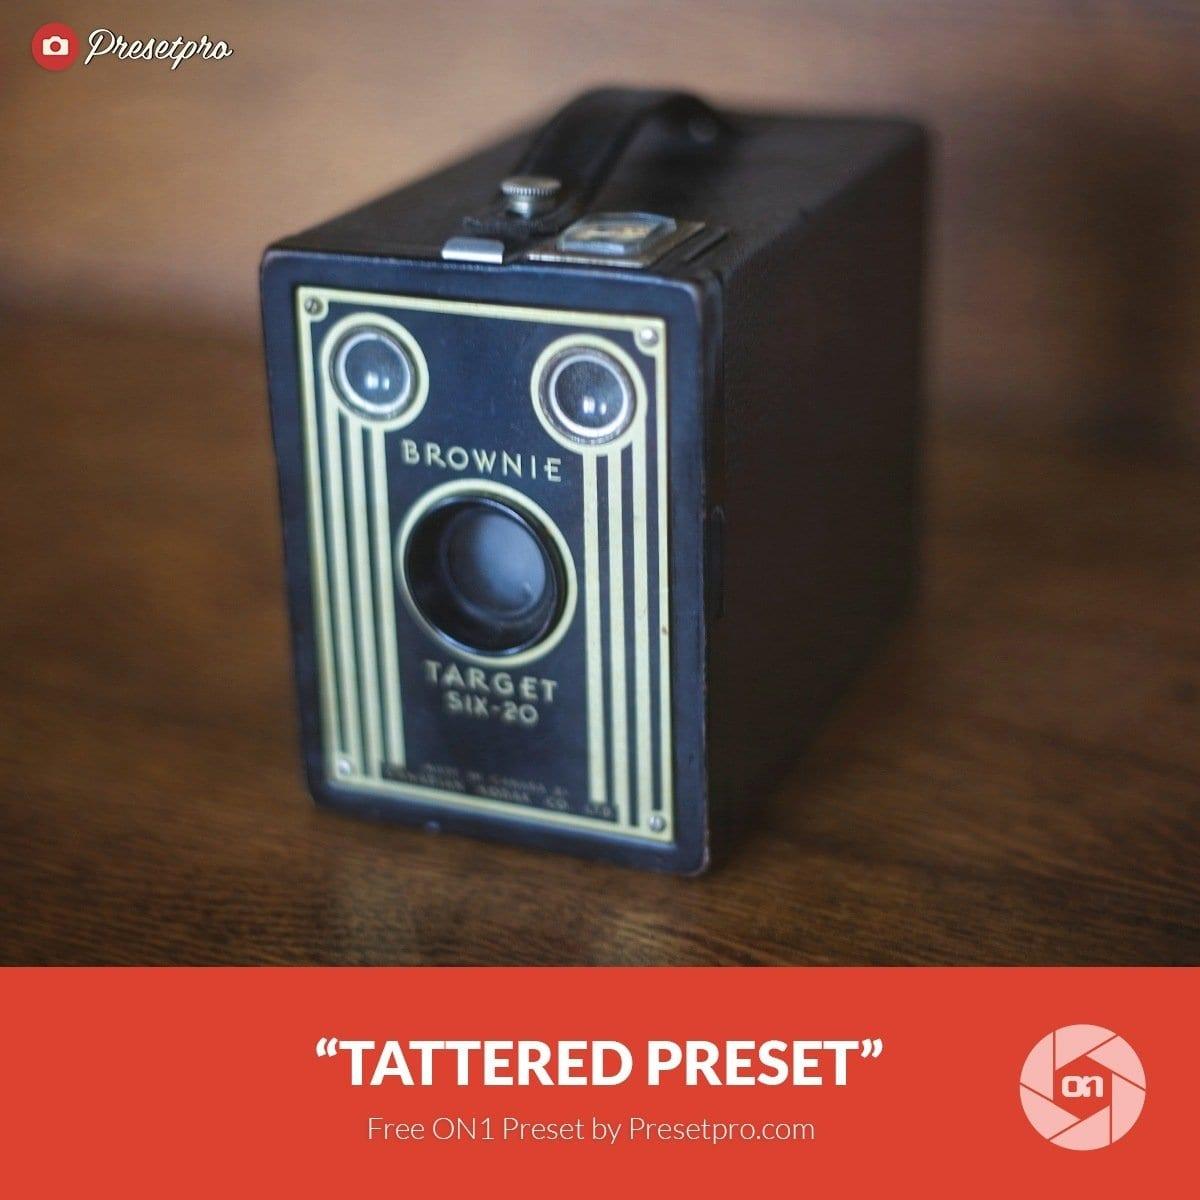 Free-On1-Preset-Tattered-Presetpro.com